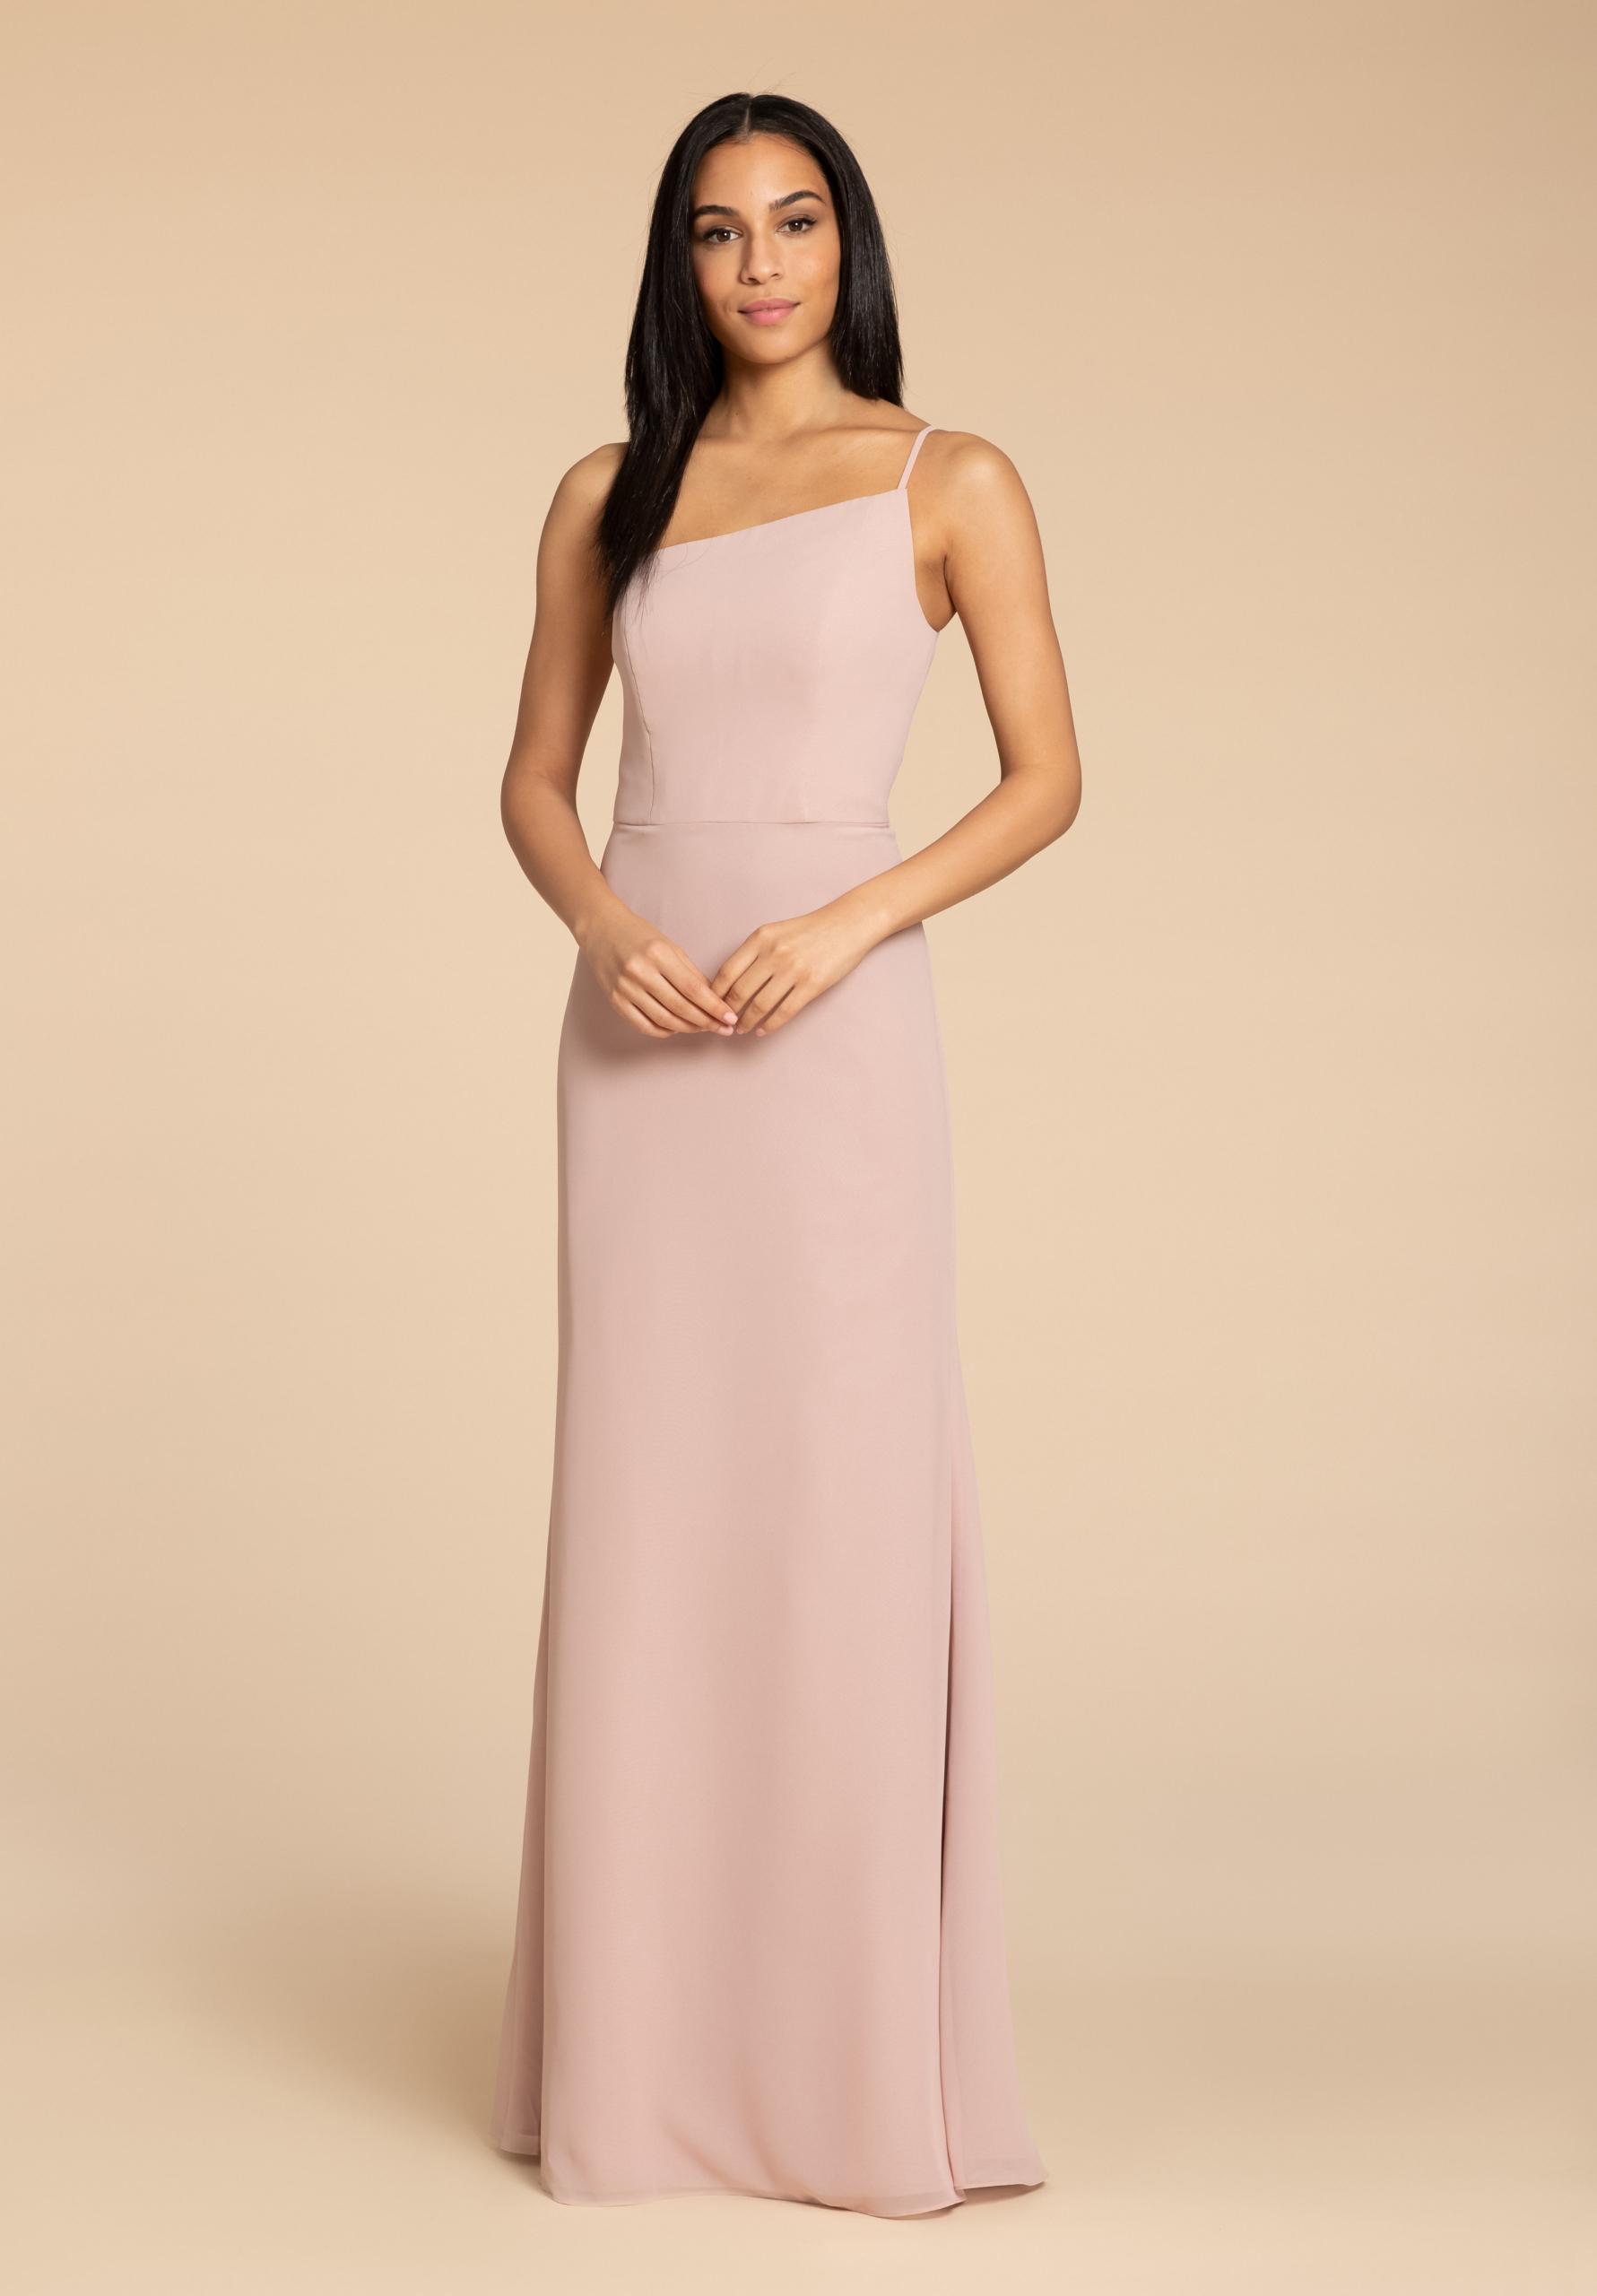 5962 houston hayley paige pink bridesmaid dresses